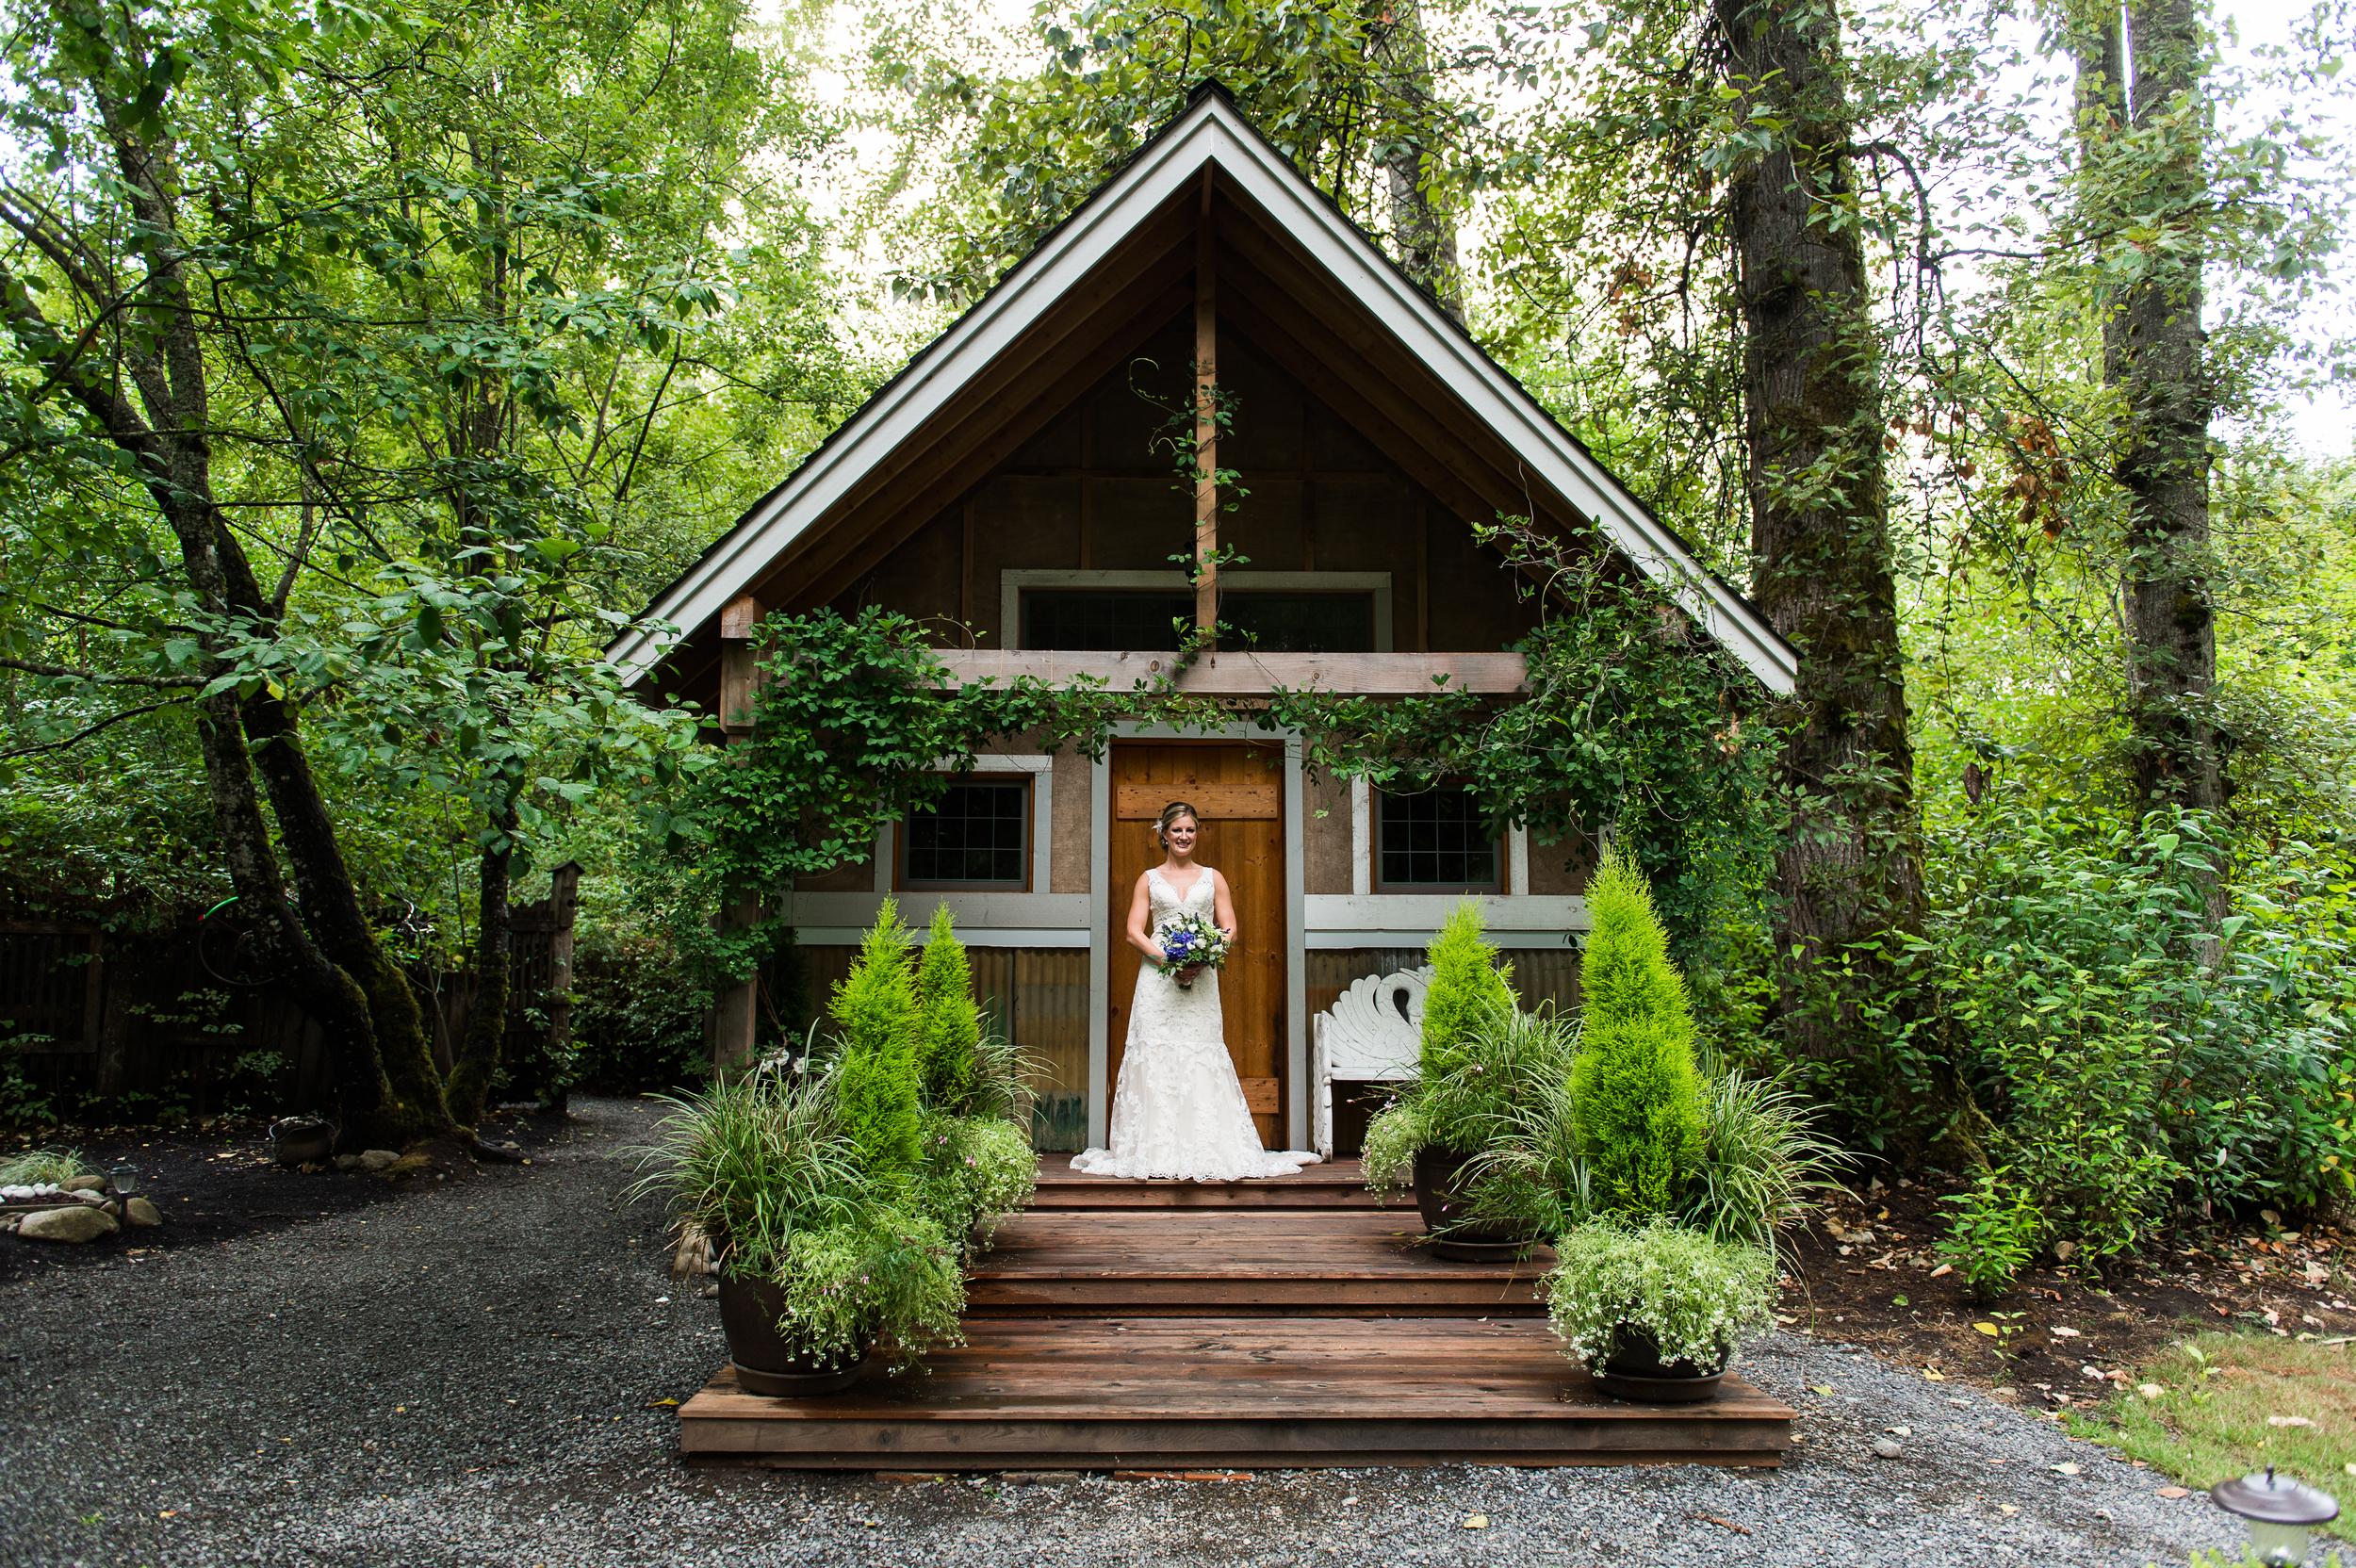 JJ-wedding-Van-Wyhe-Photography-080.jpg